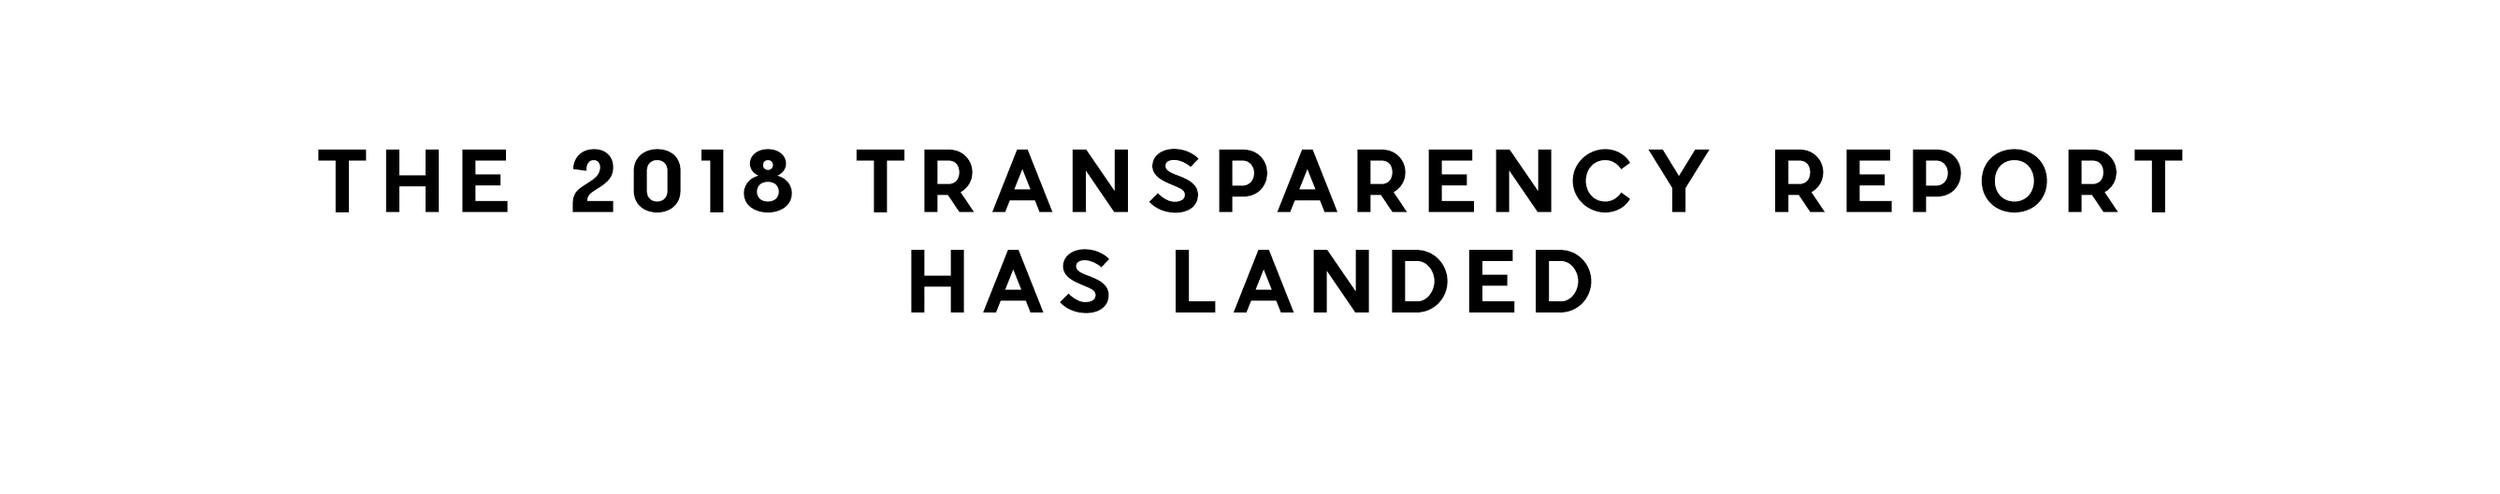 LANDED-SMALLER.png